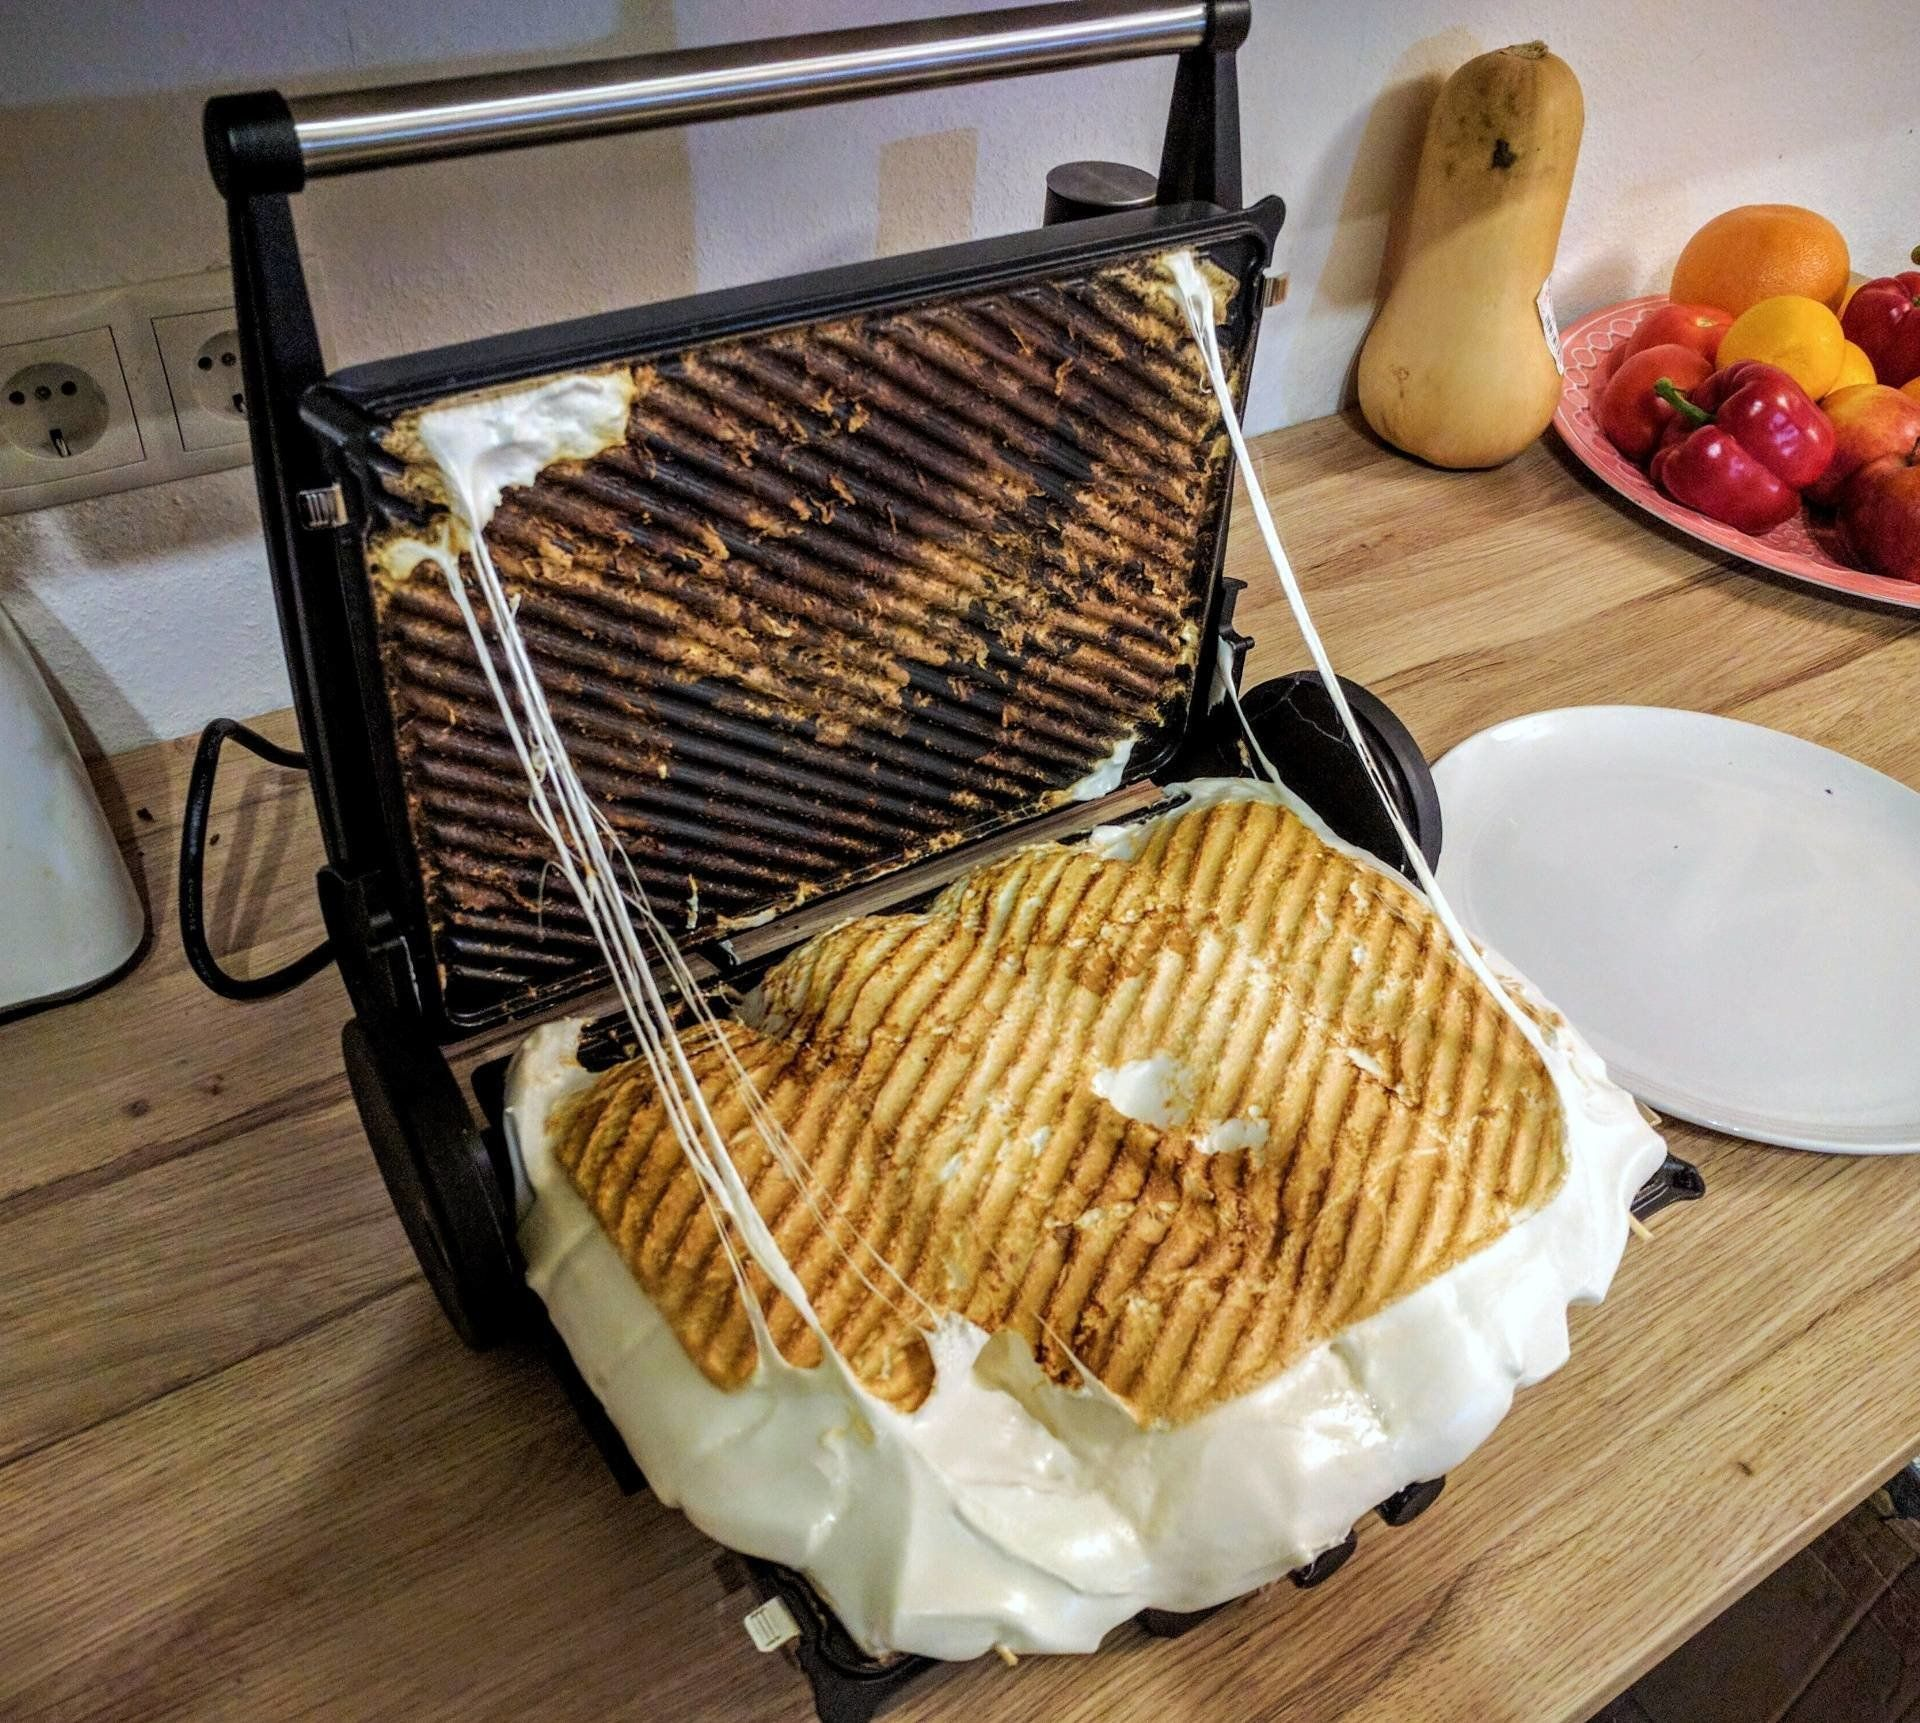 Reddit userkahnii put 20 marshmallows on this grill.